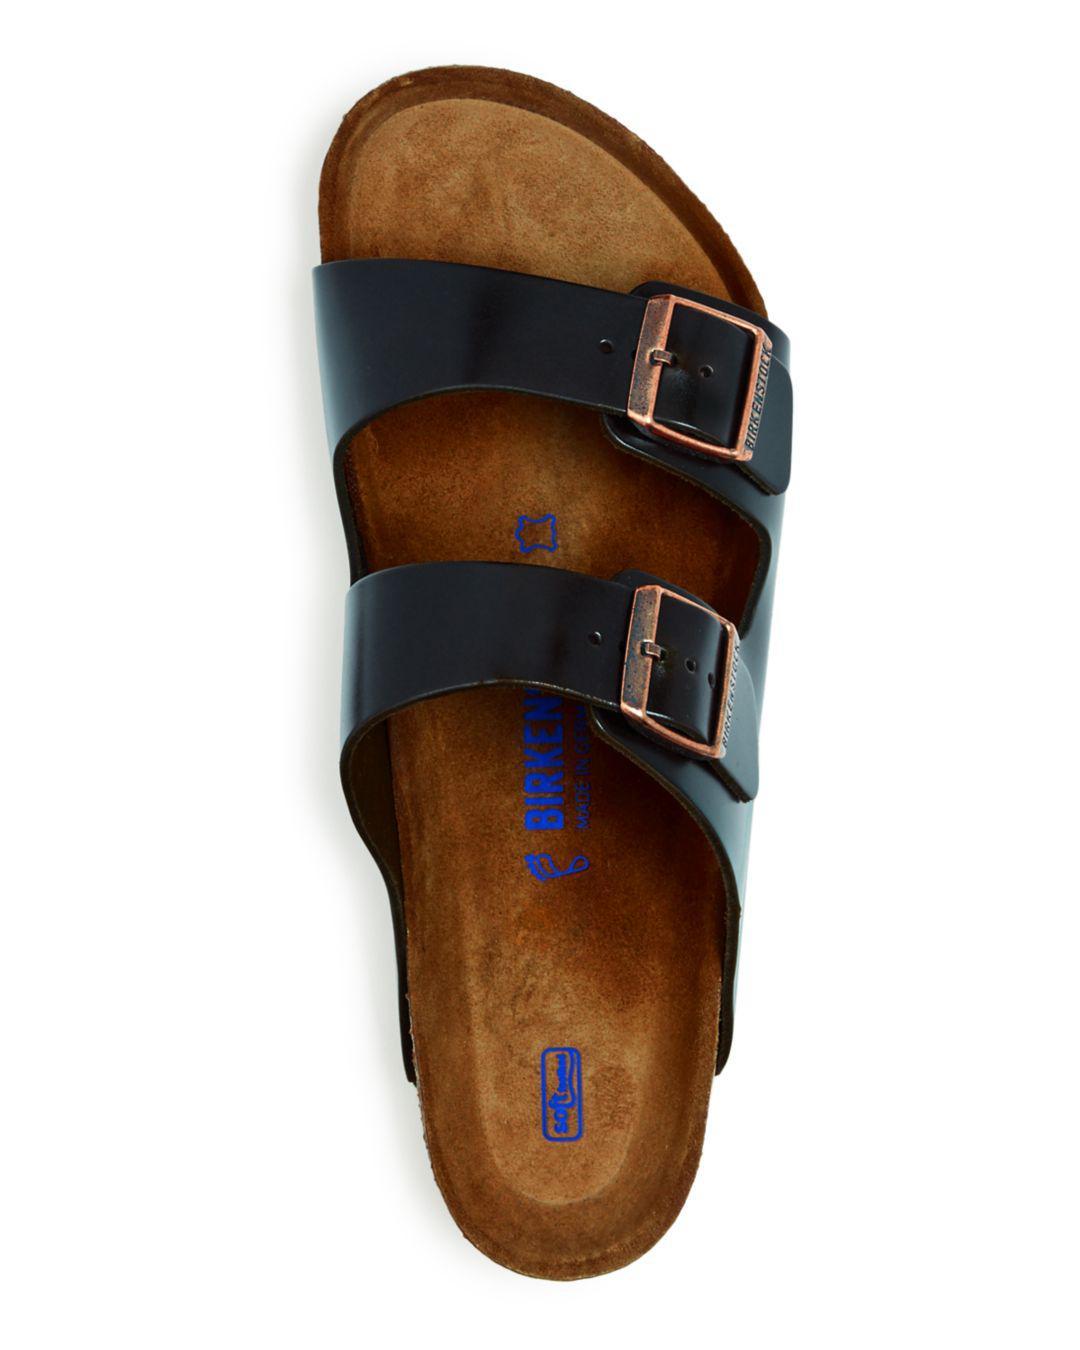 db201e210ff9 Lyst - Birkenstock Men s Arizona Leather Slide Sandals in Brown for Men